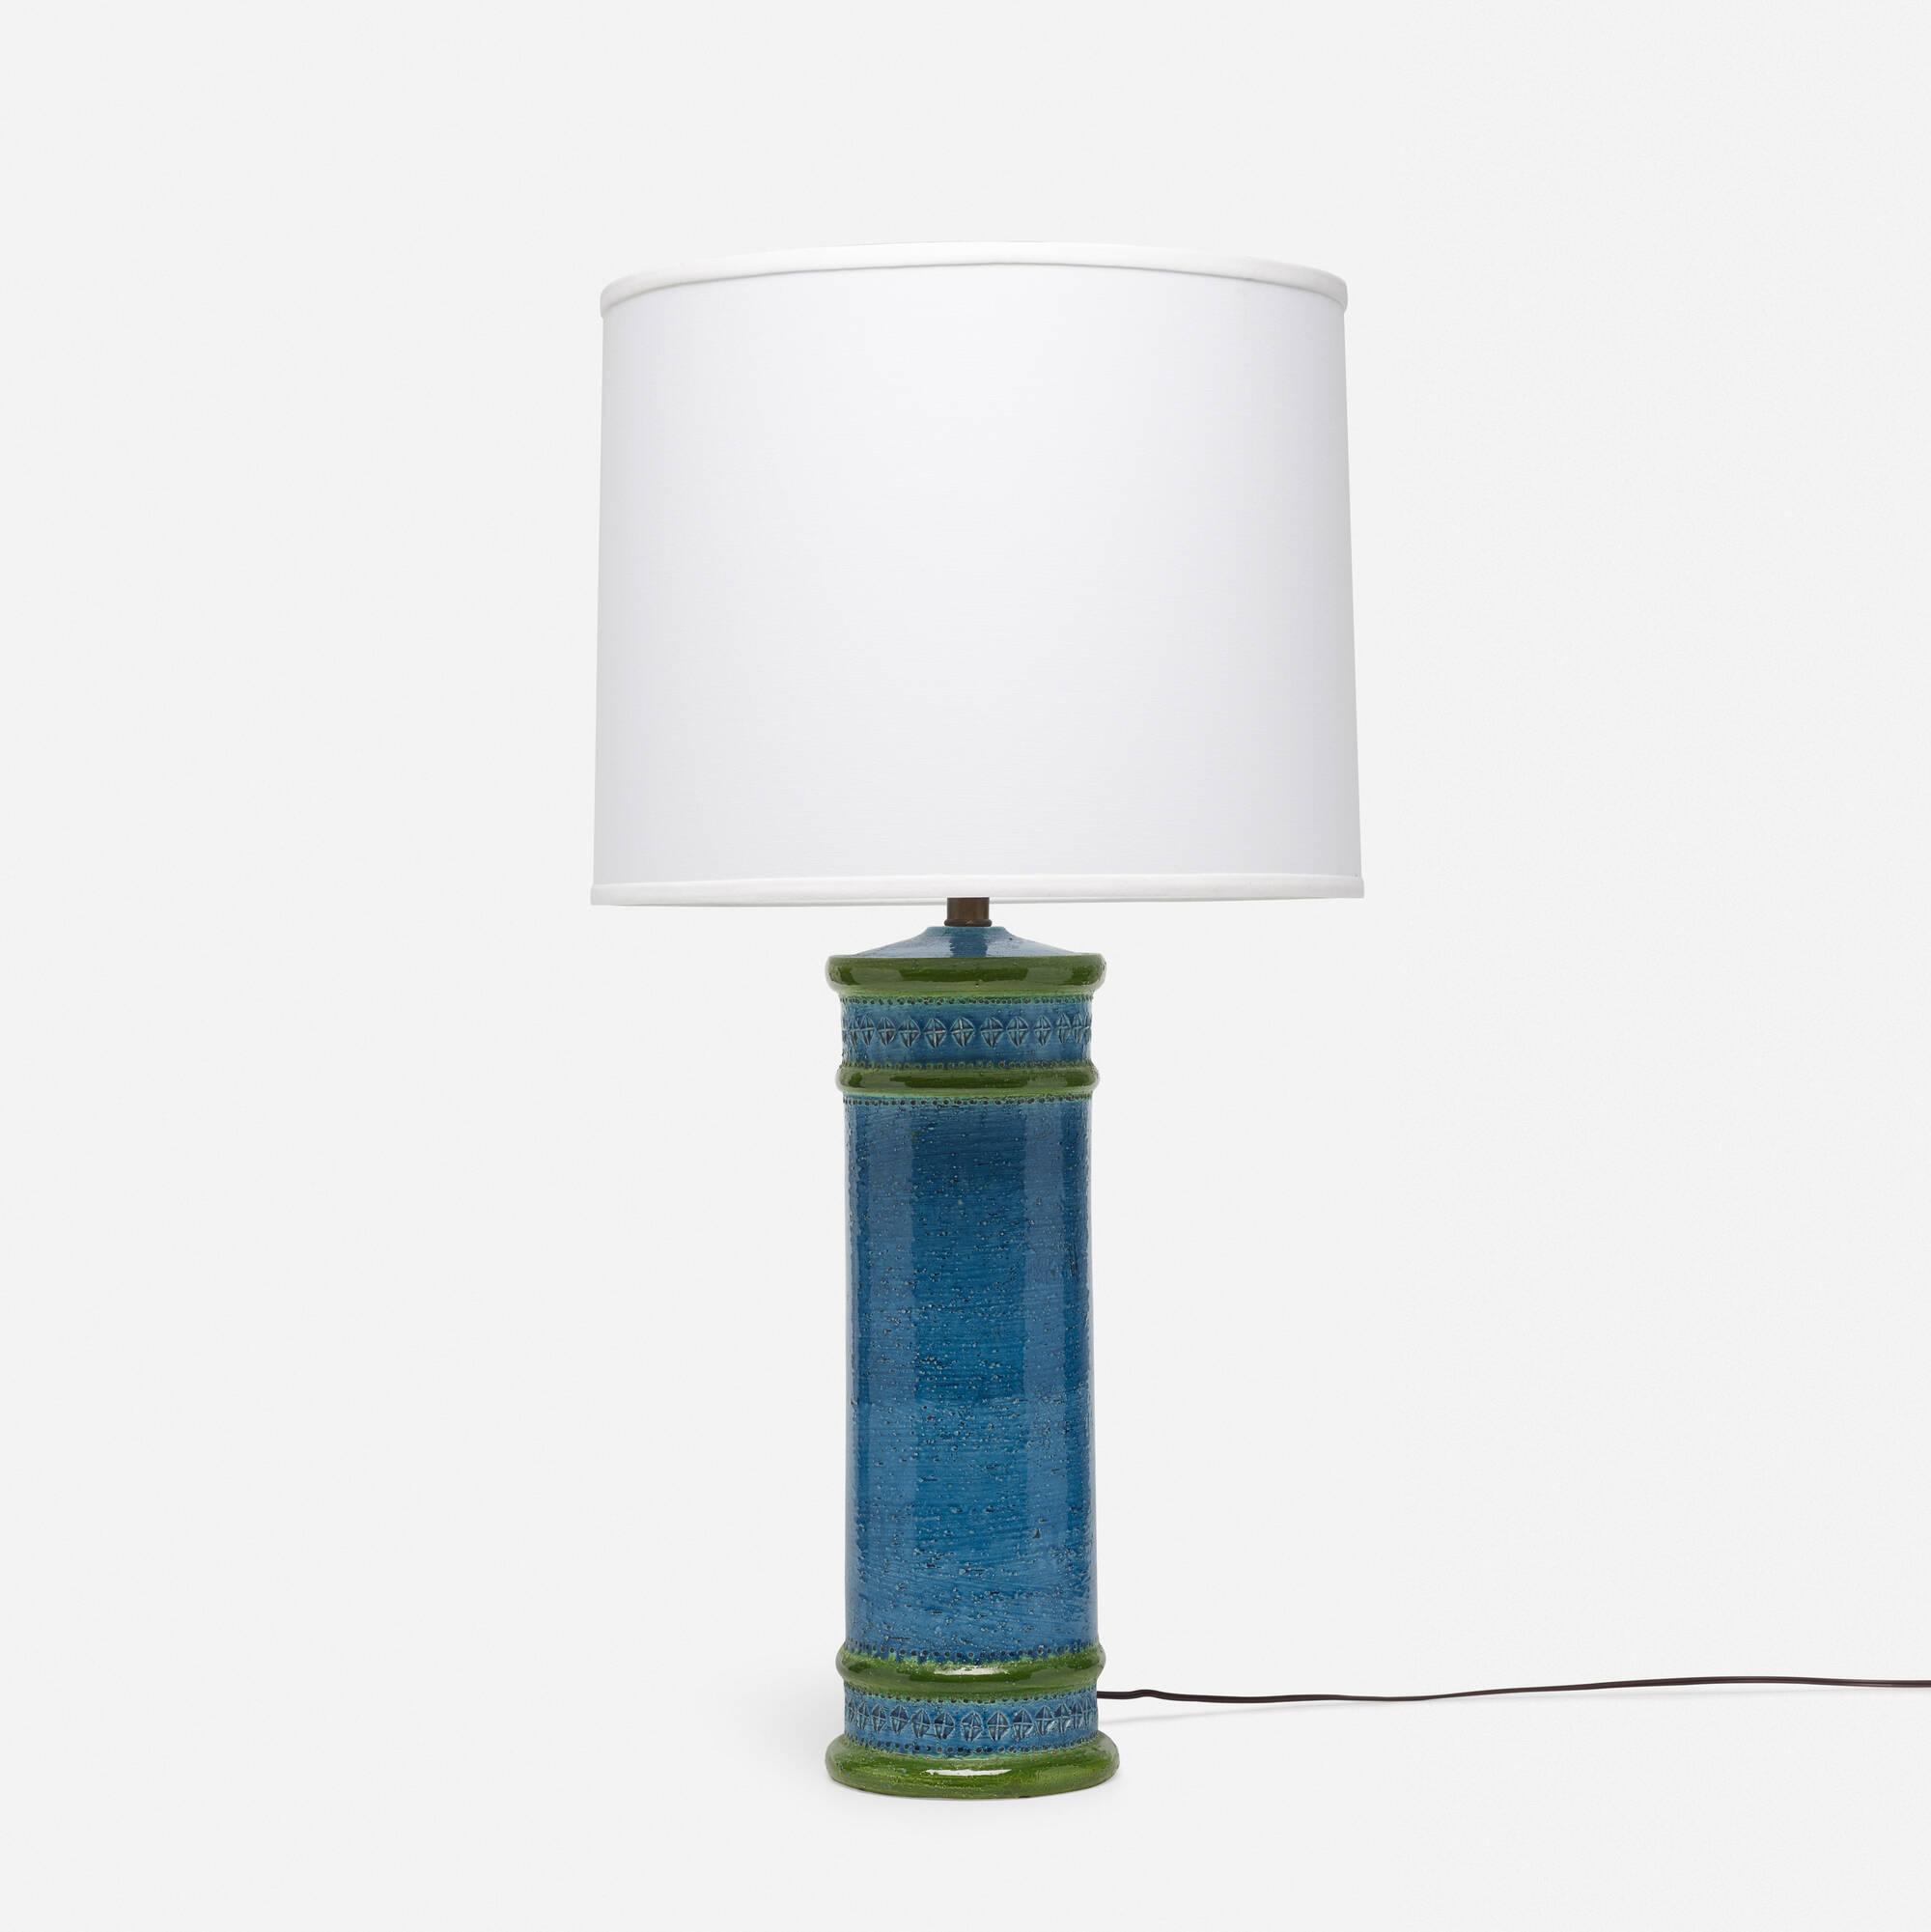 403: Bitossi / table lamp (1 of 1)